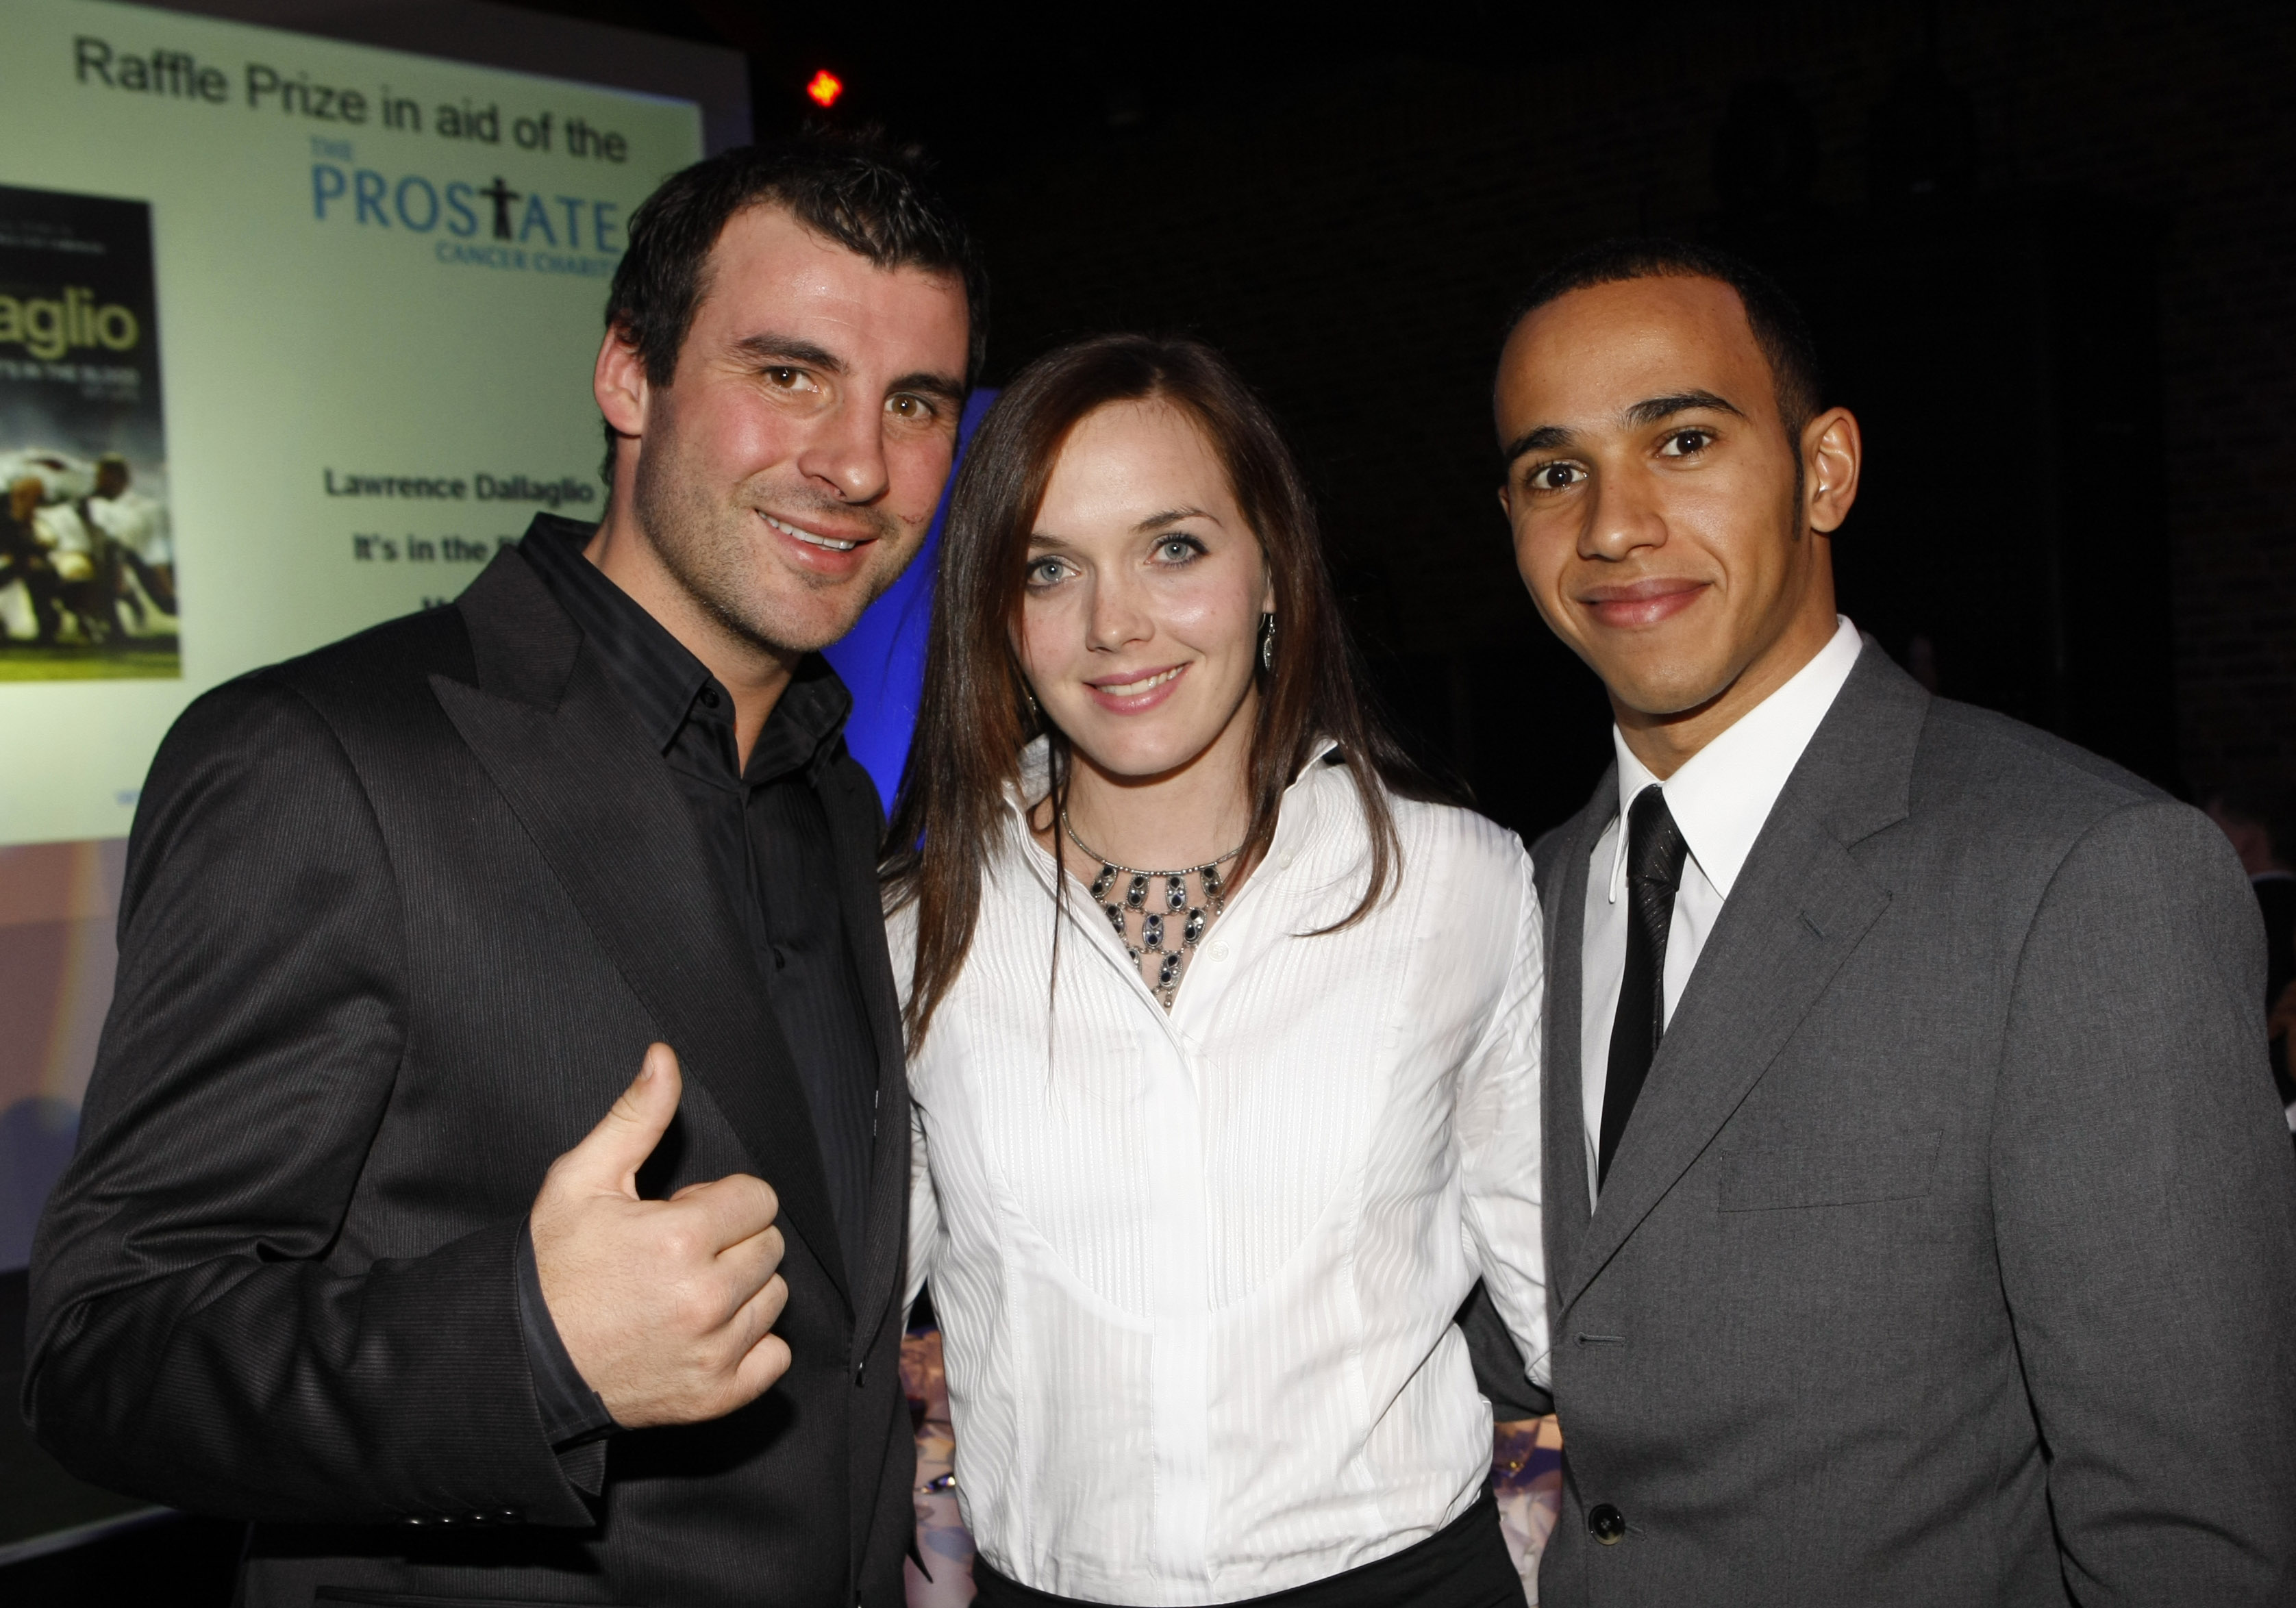 Joe Calzaghe, Victoria Pendleton and Lewis Hamilton, star guests at an SJA awards